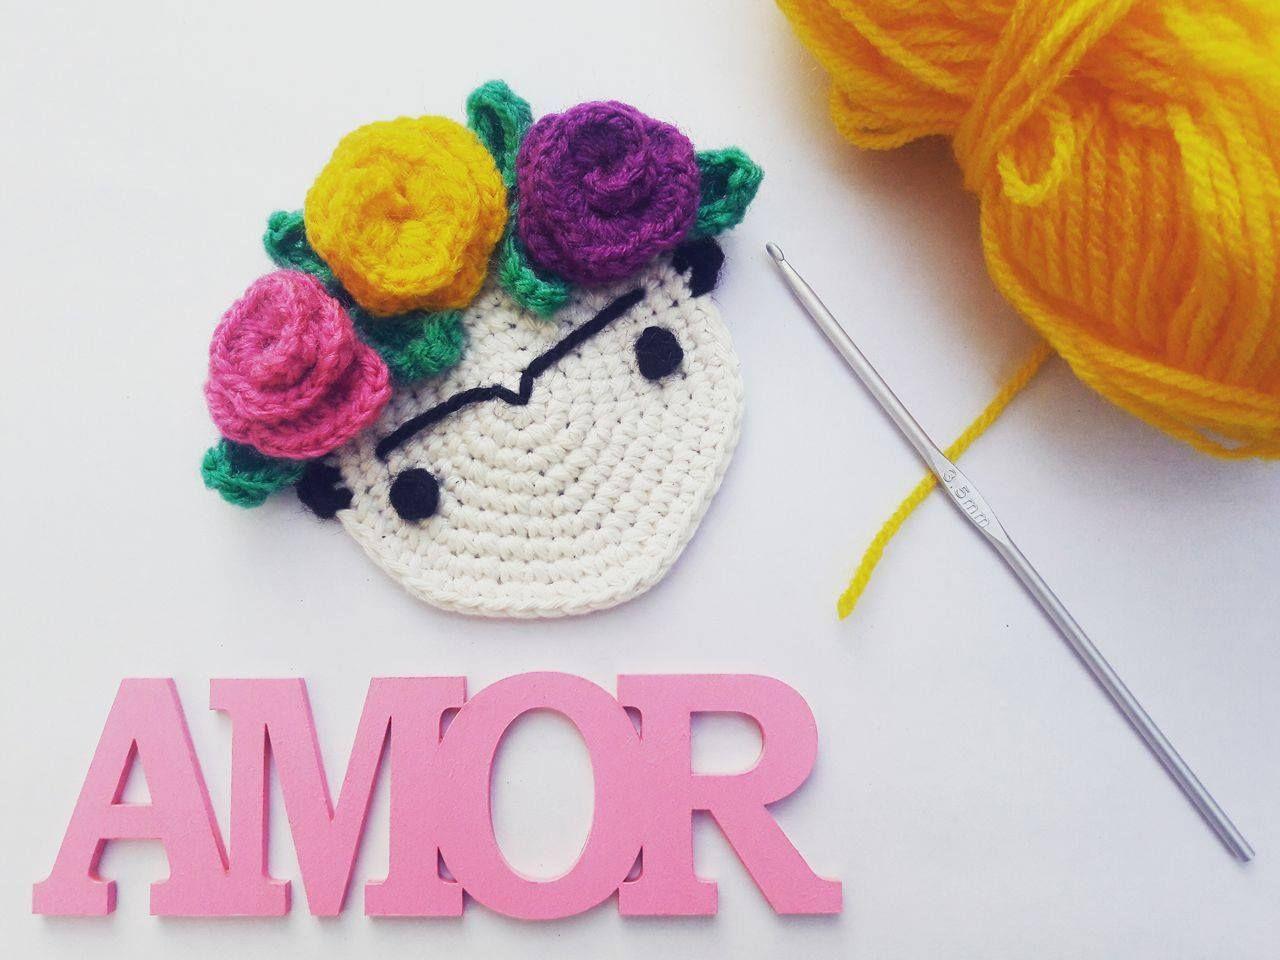 Frida Kahlo a Crochet | Manualidades desde casa, Dulce amor y Hacer ...